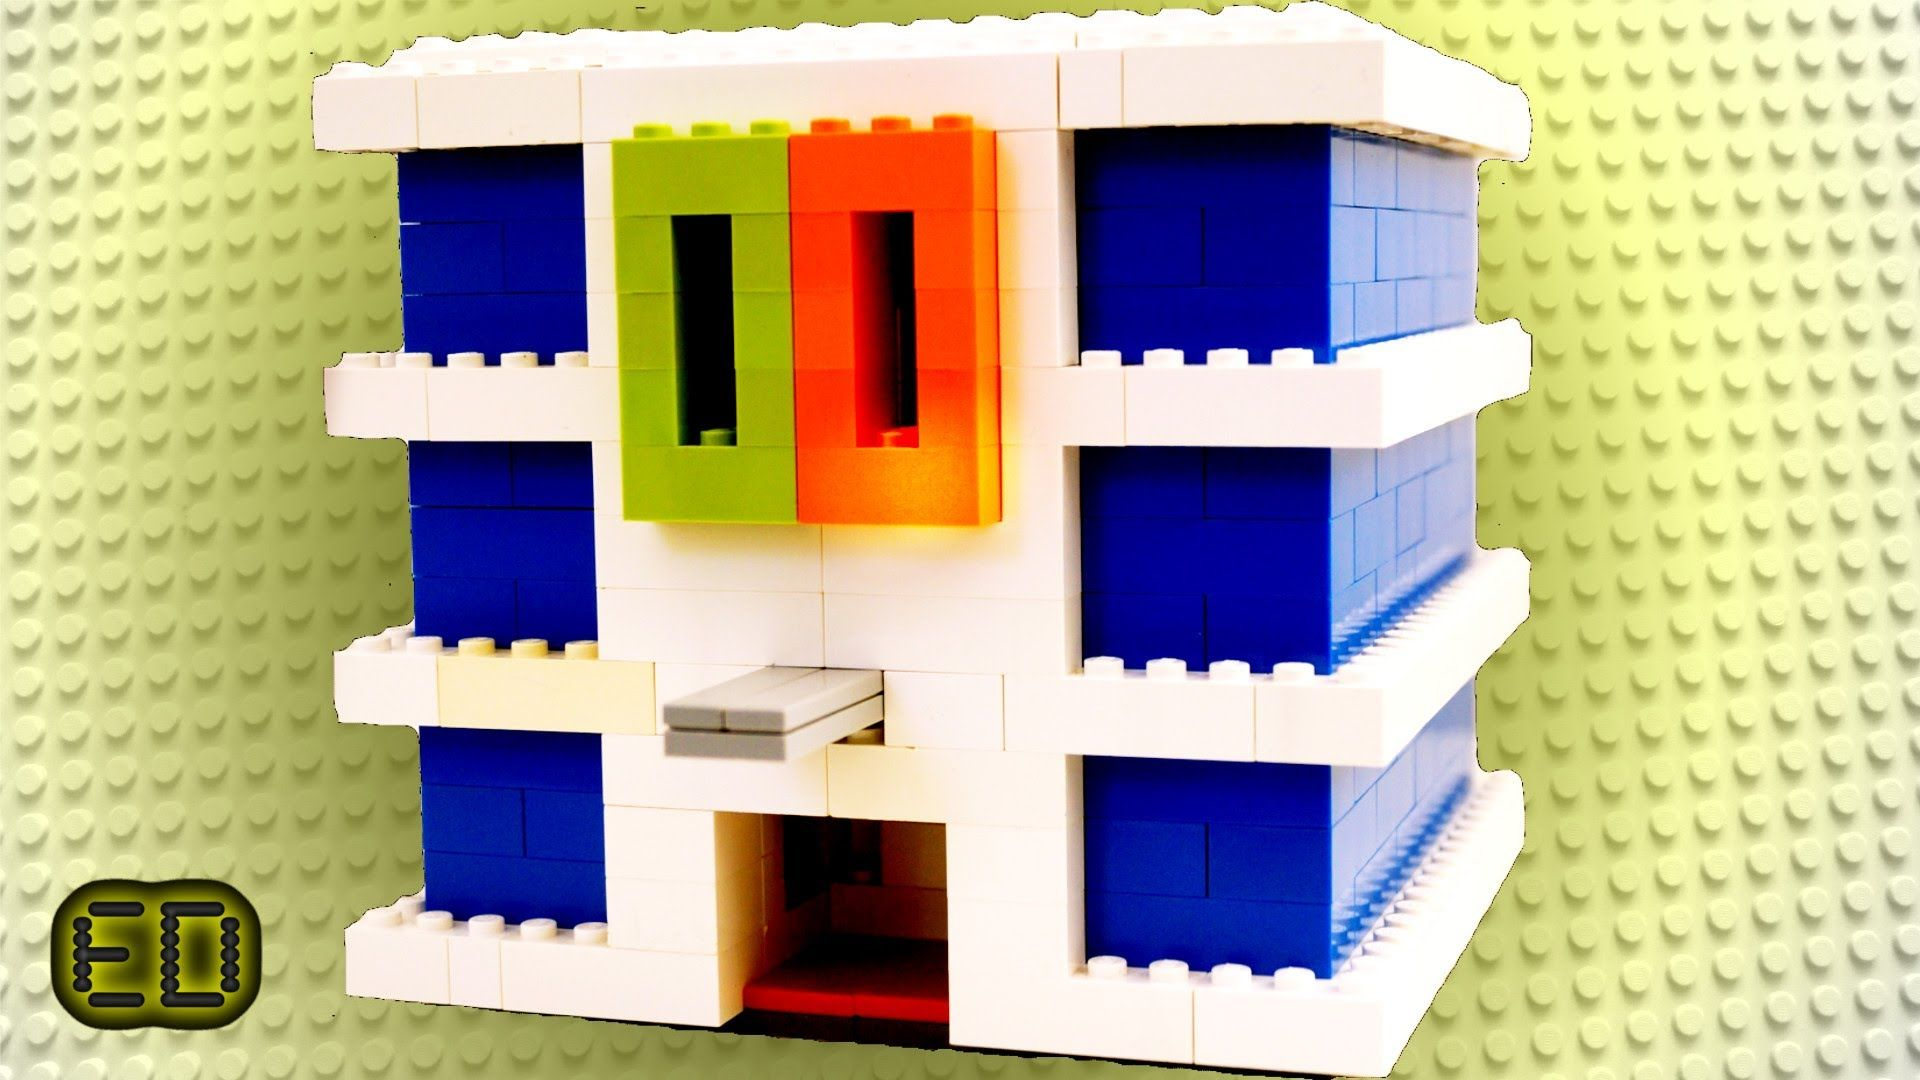 Lego Candy Machine V41 Its Made Completely Of Legos No Mechanics